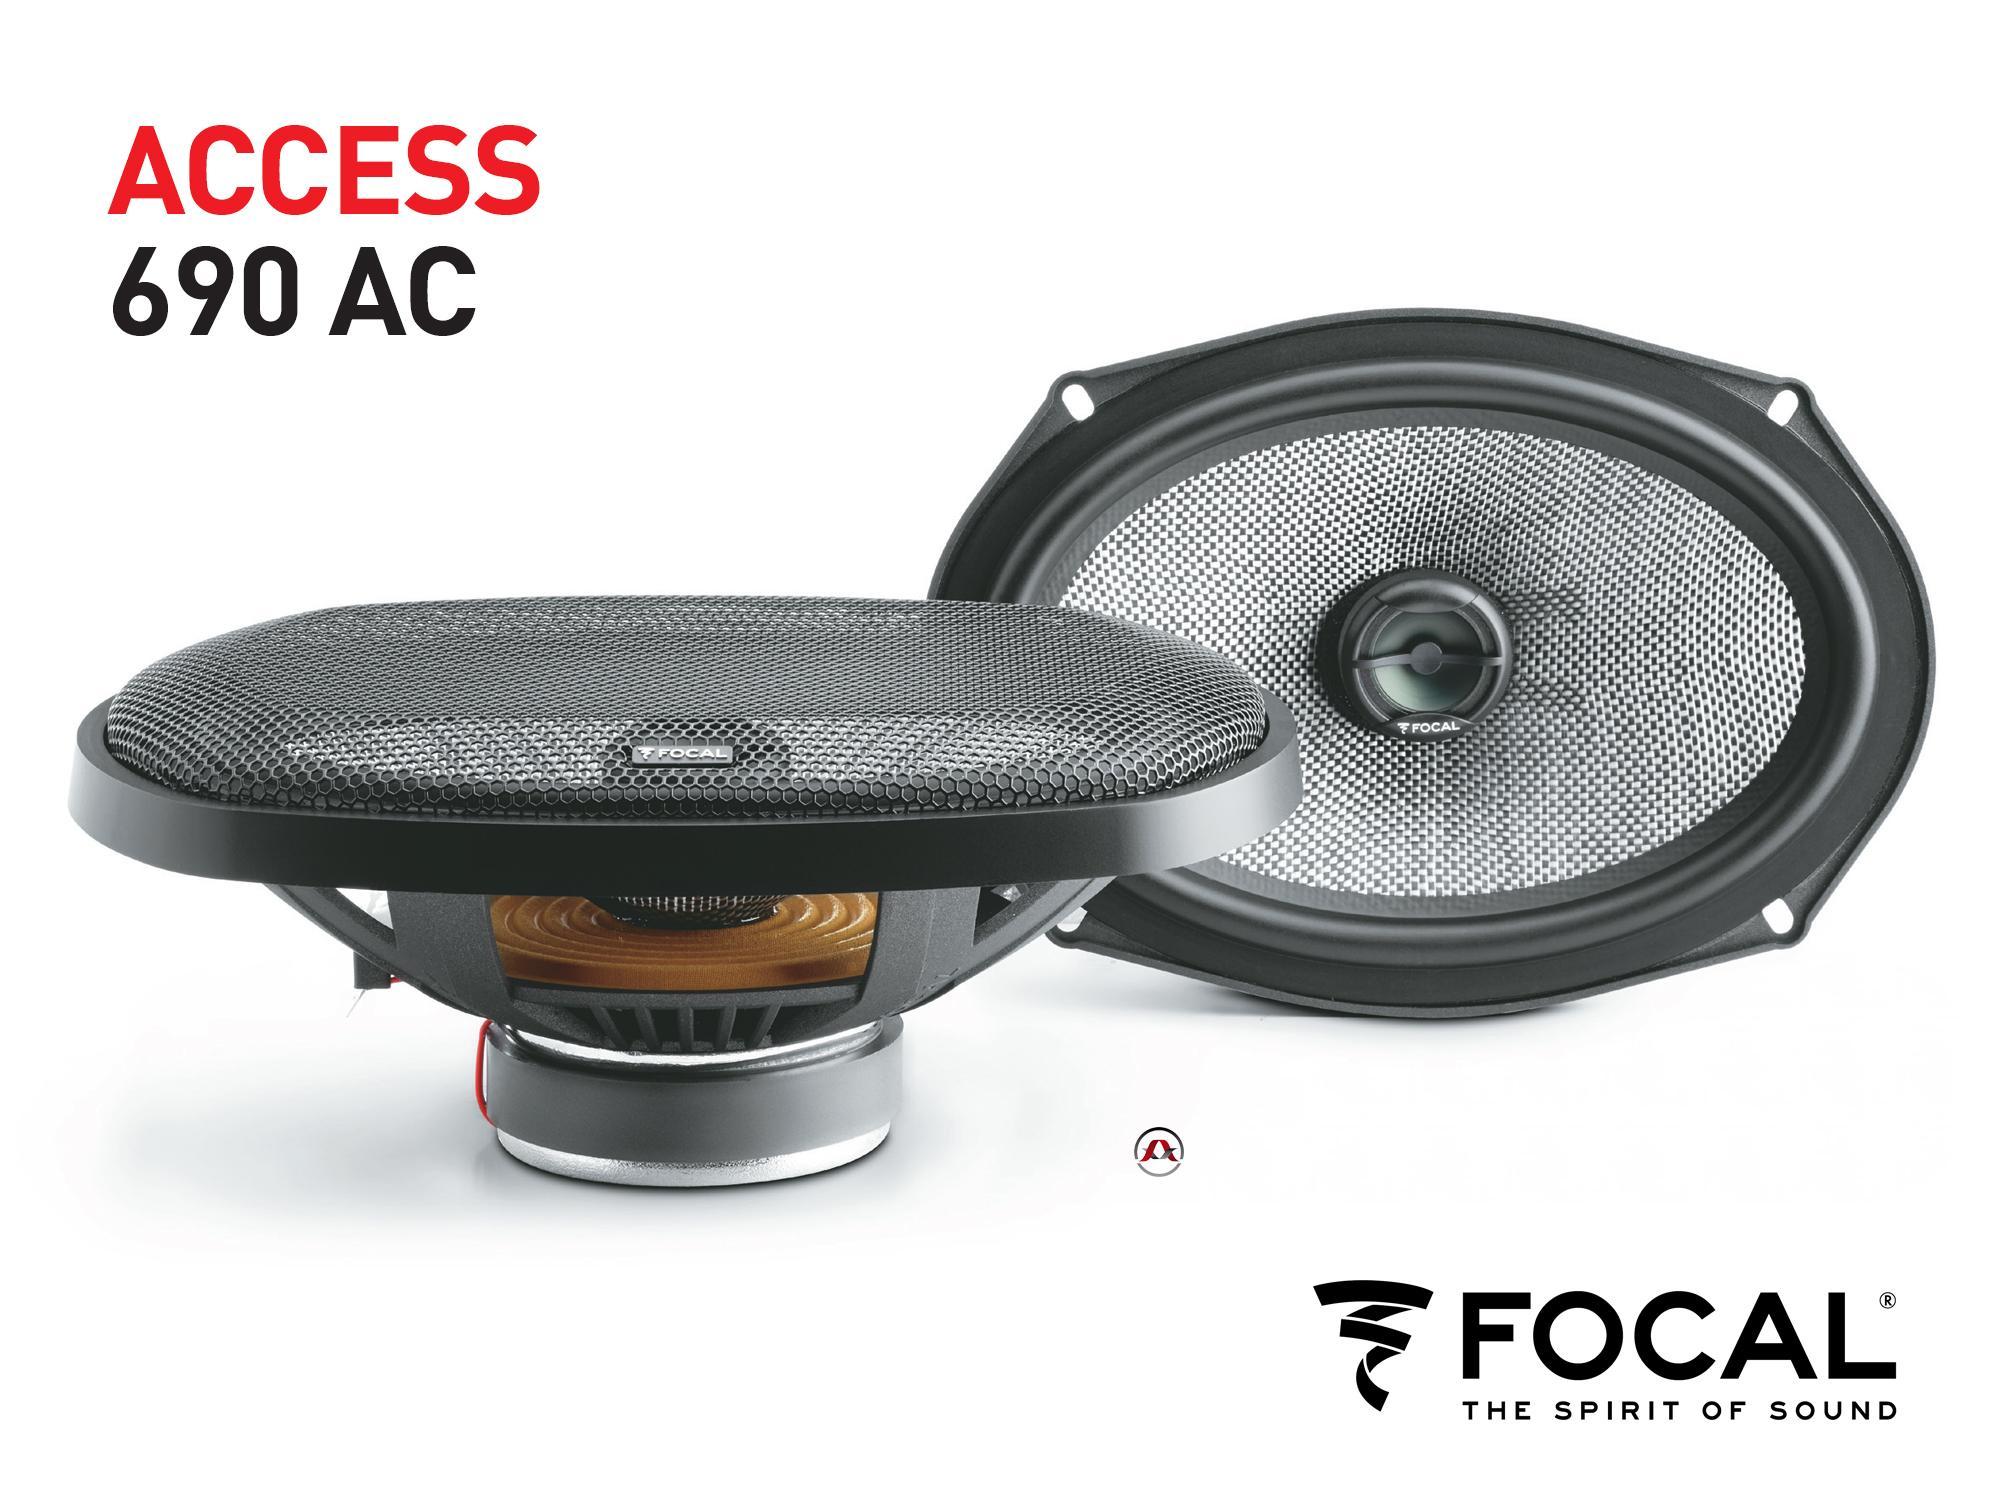 hp focal focal access 690 ac 6x9p. Black Bedroom Furniture Sets. Home Design Ideas